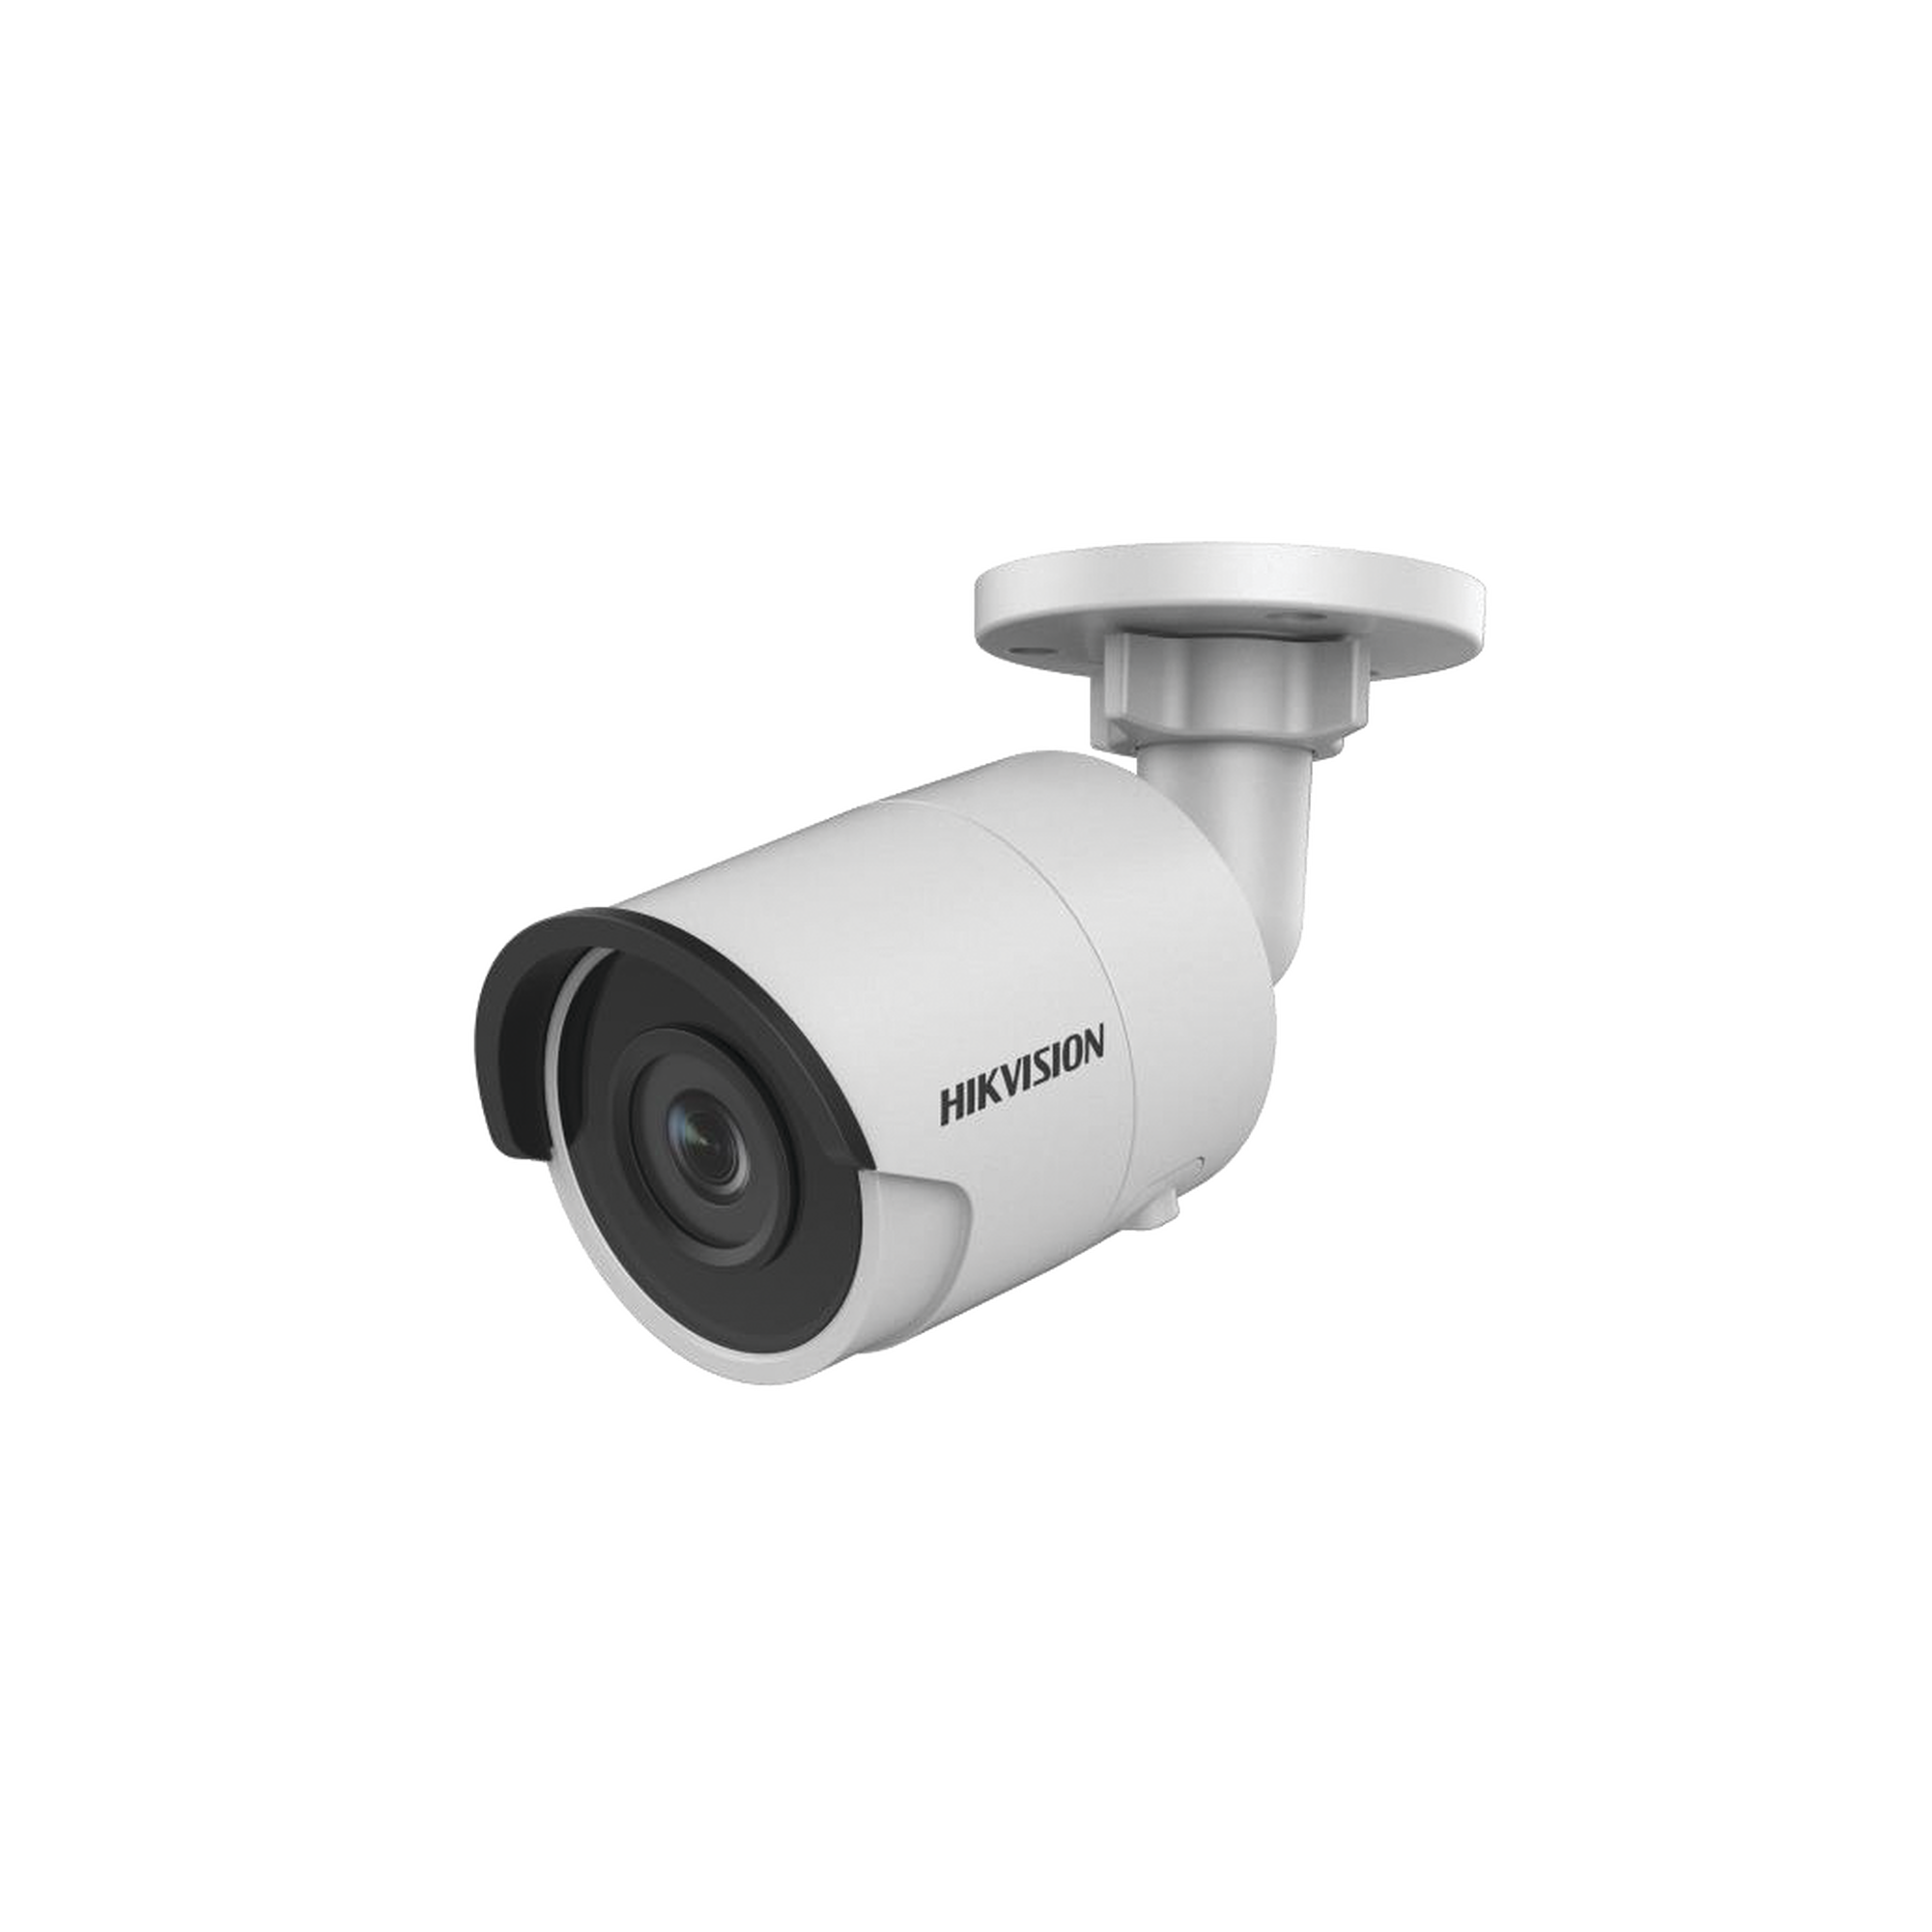 Mini Bala IP 4 Megapixeles / Serie PRO / 30 mts IR EXIR / Exterior IP67 / Lente 2.8 mm / WDR 120 dB / PoE / Micro SD / Videoanaliticos Integrados